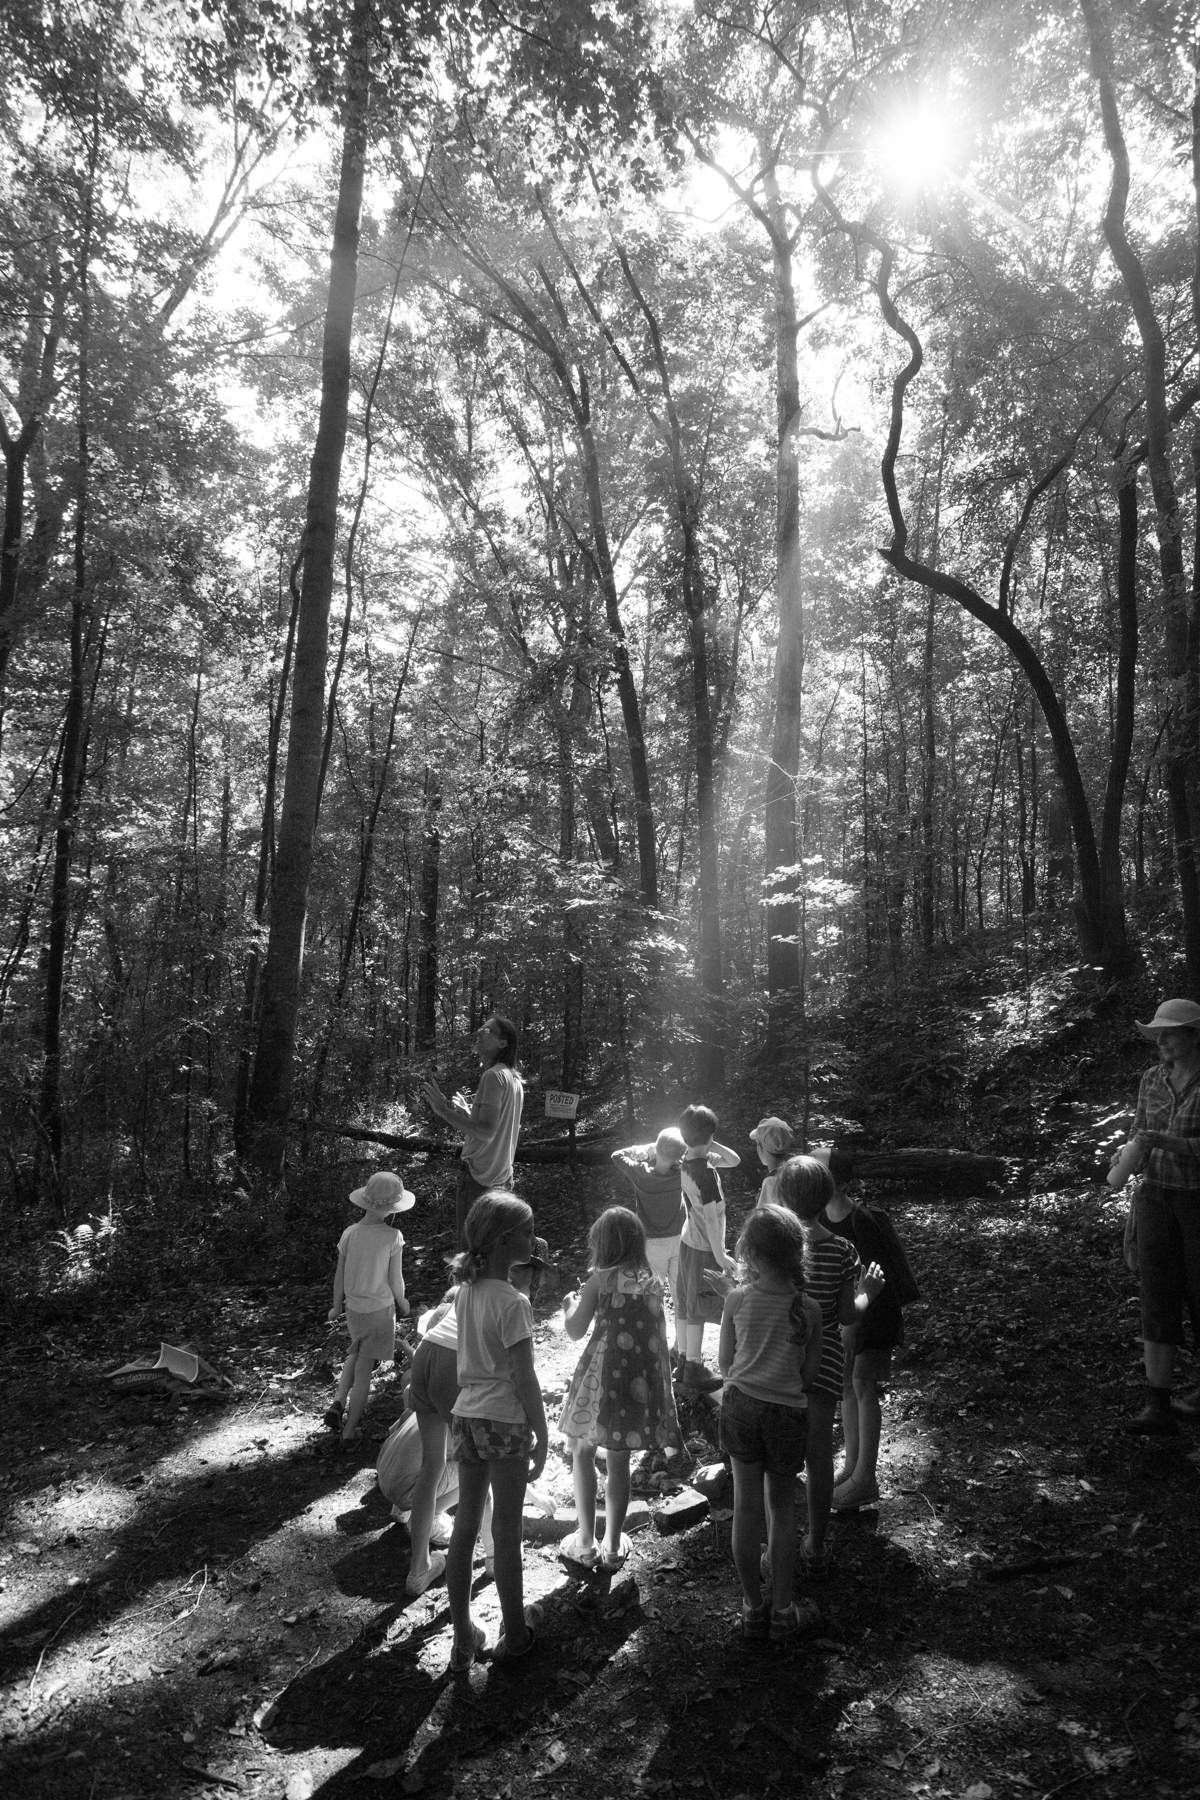 RA_story of the land camp-201606297962.jpg